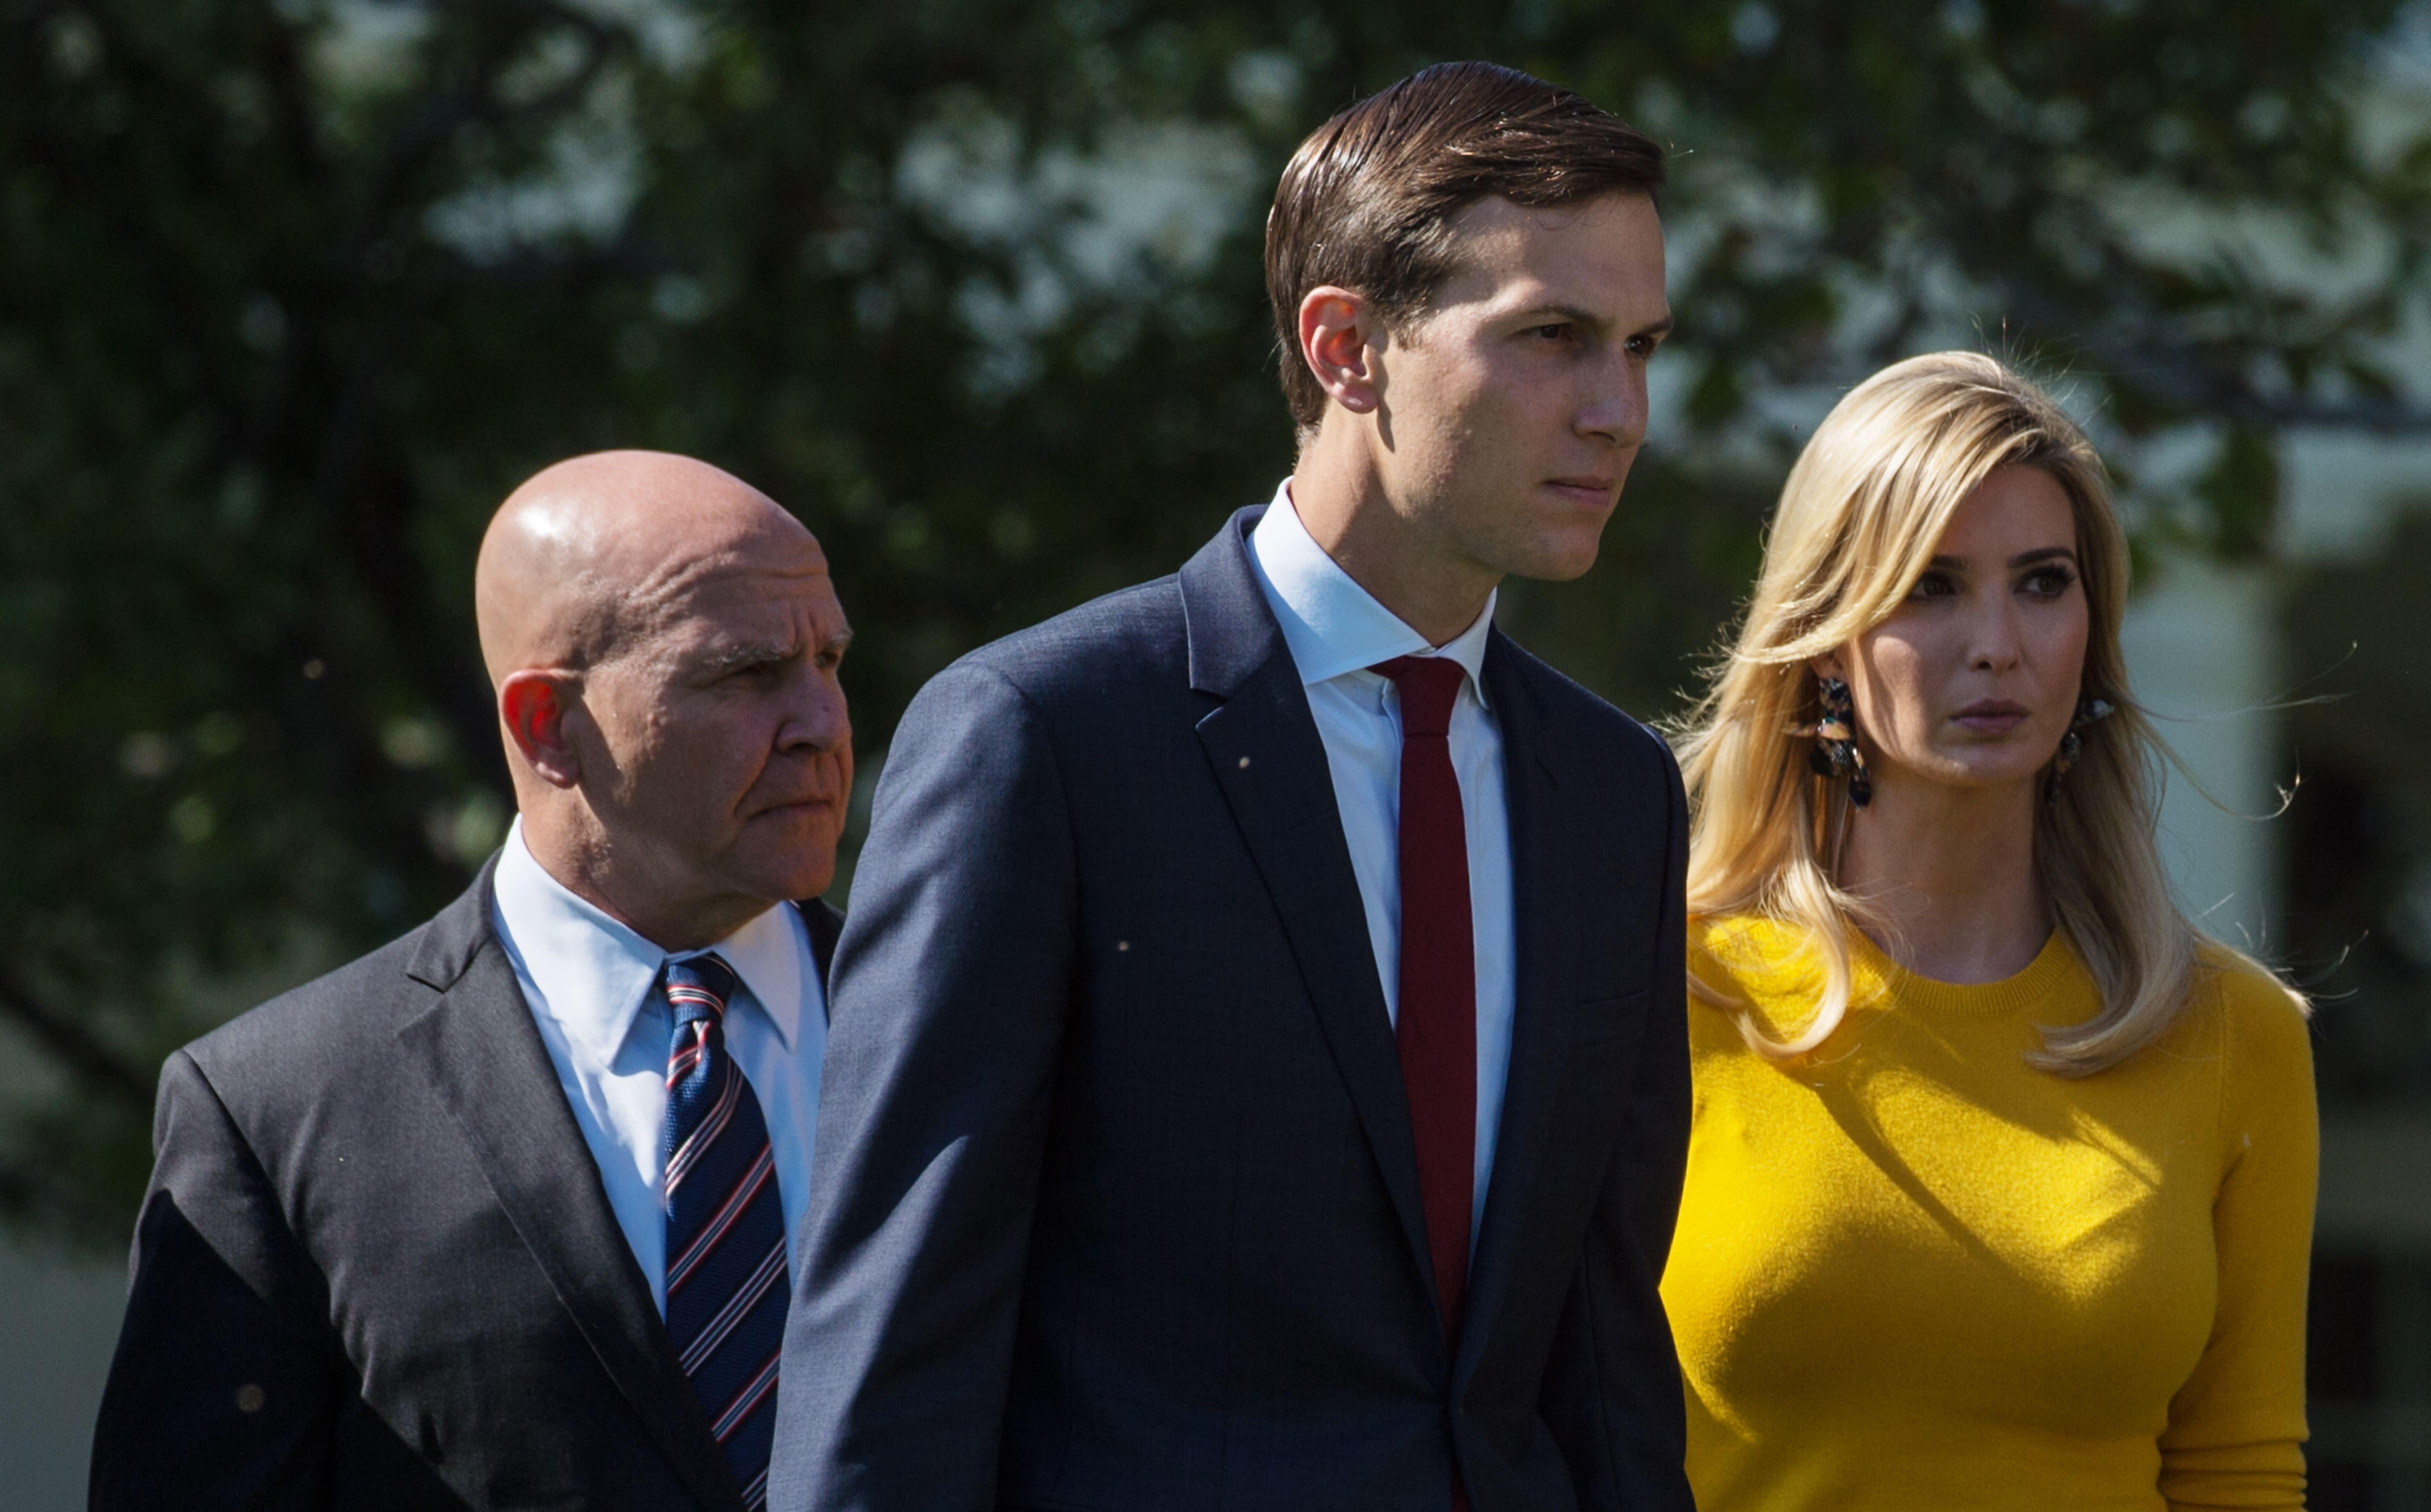 Donald Trump Wants Ivanka and Jared Kushner to Move Back Home to NYC